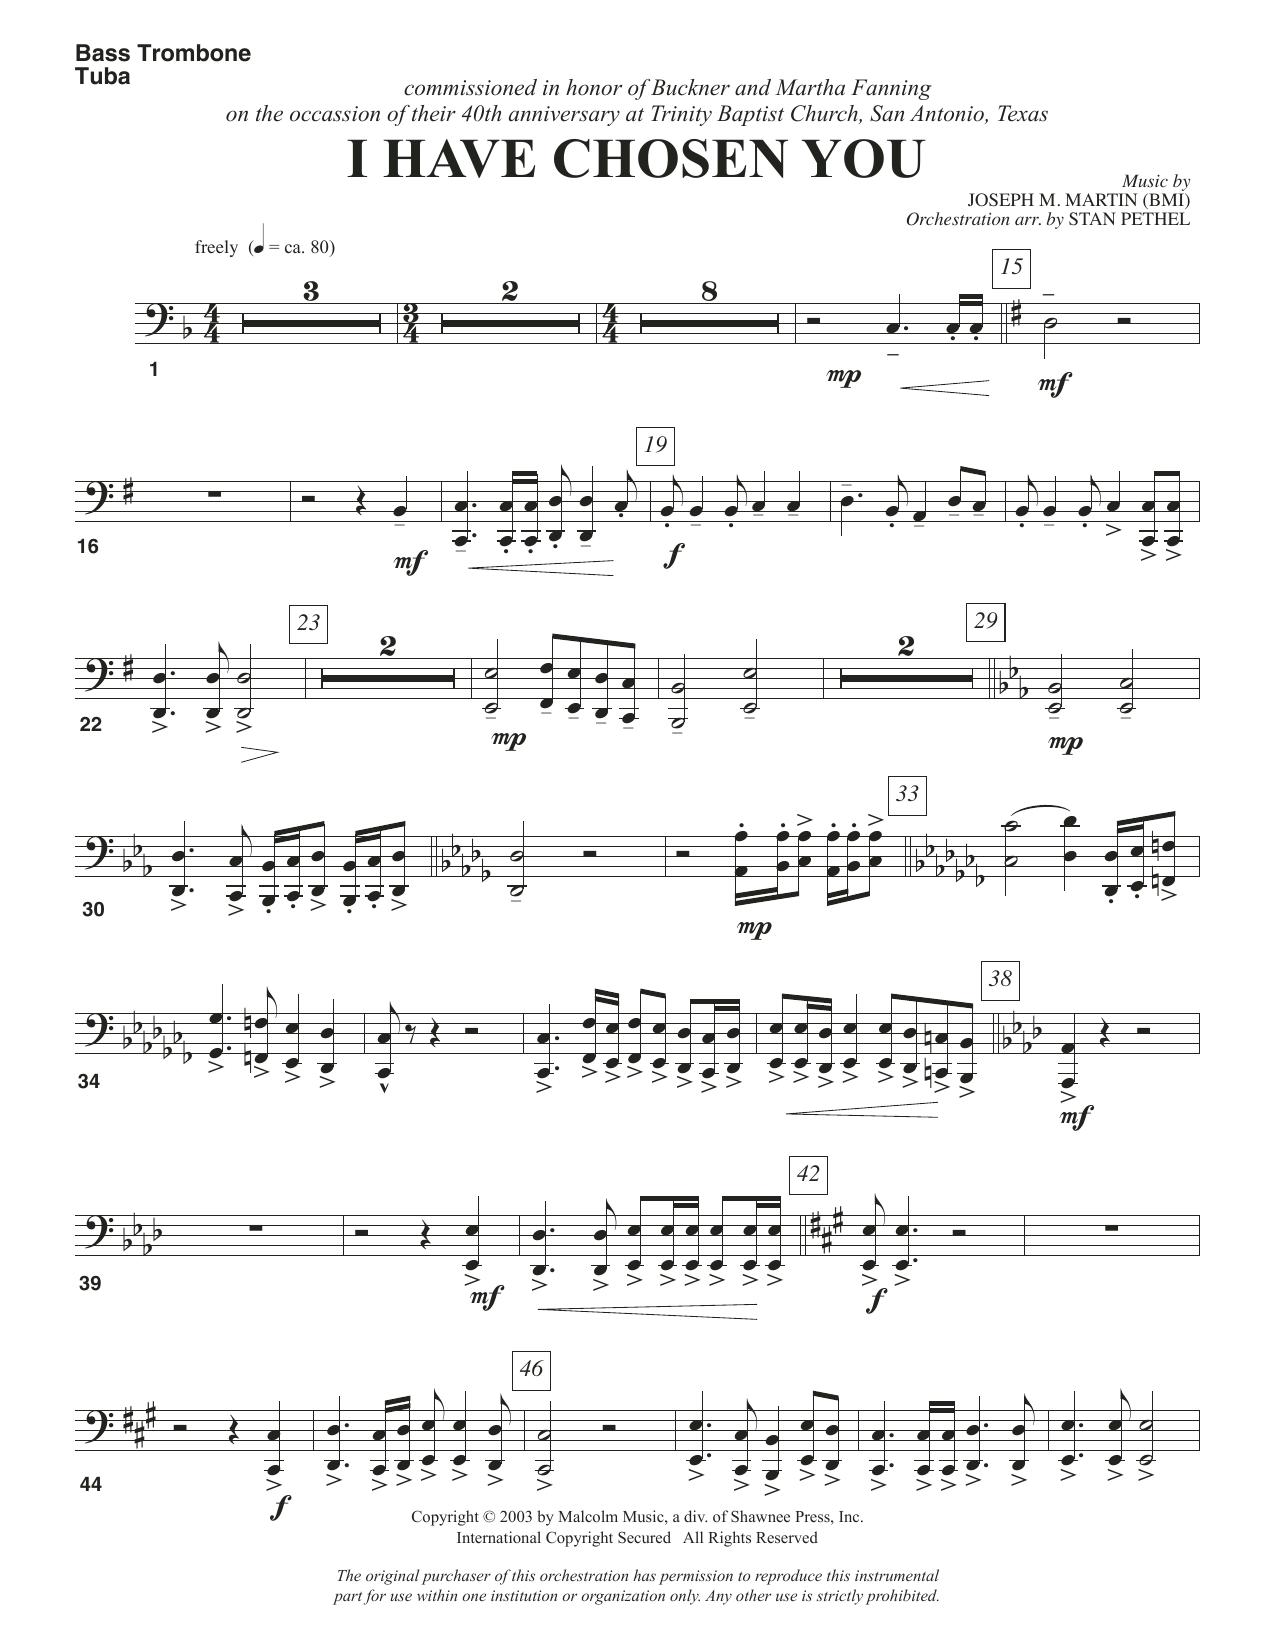 I Have Chosen You - Bass Trombone/Tuba Sheet Music